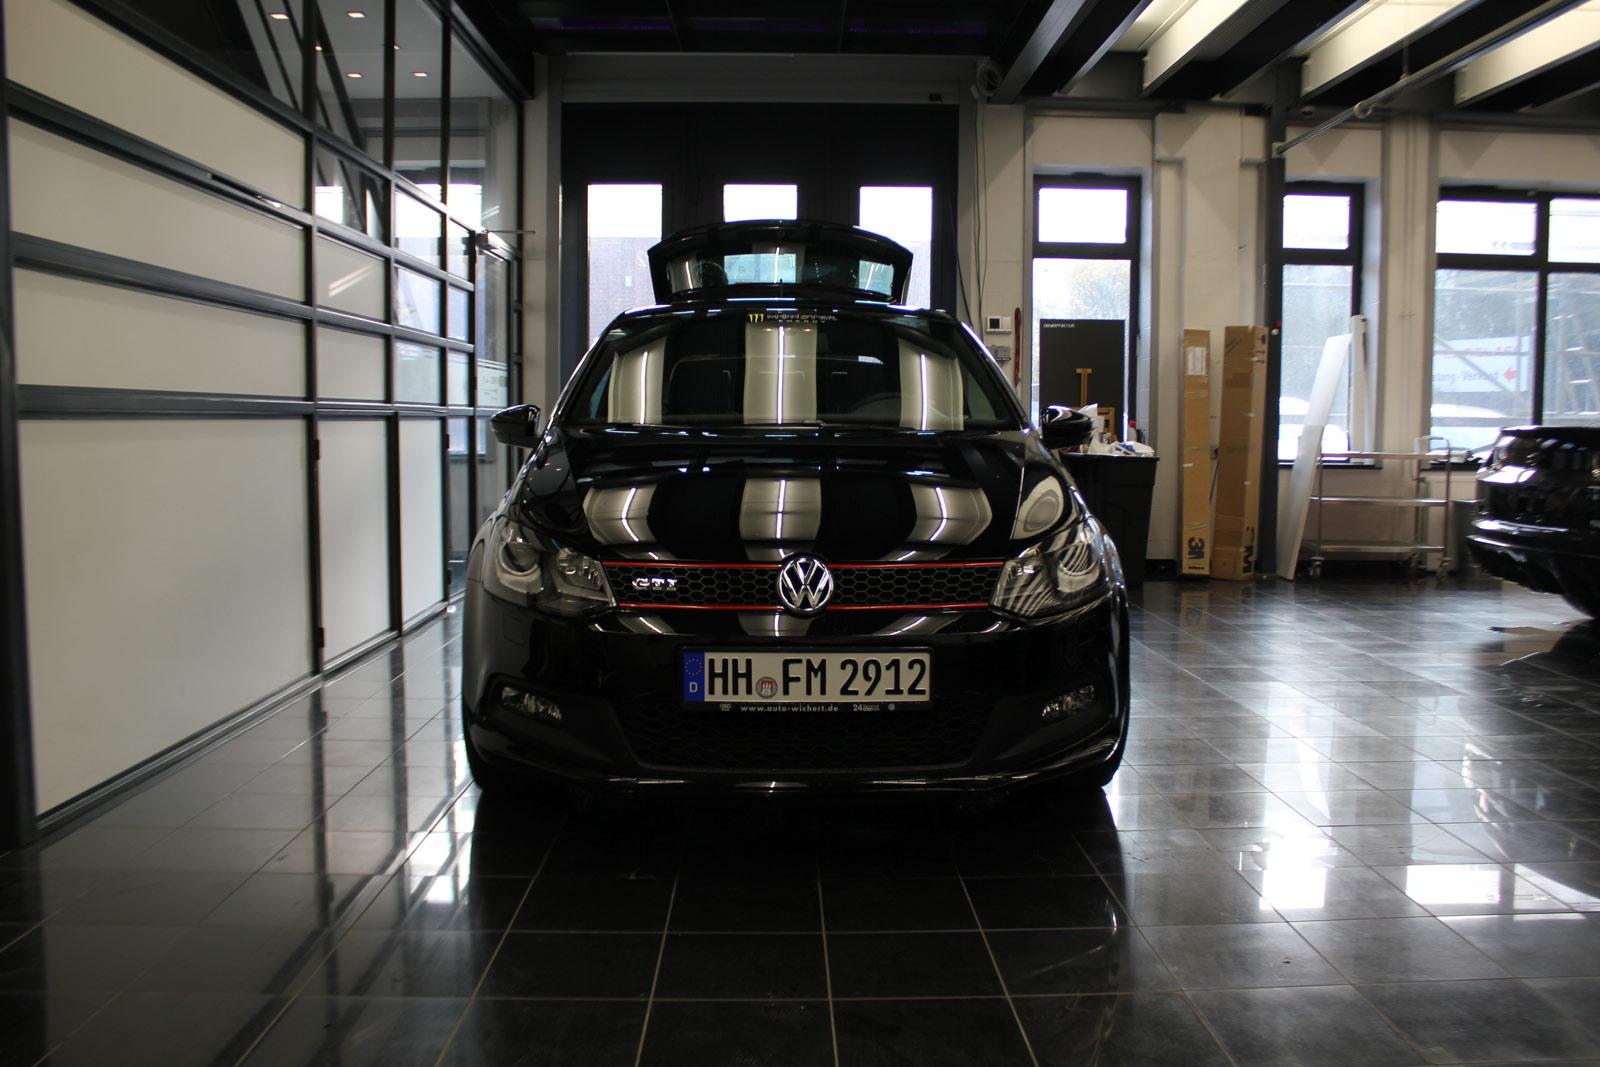 VW_Polo_GTI_Folierung_Orange_Matt_01